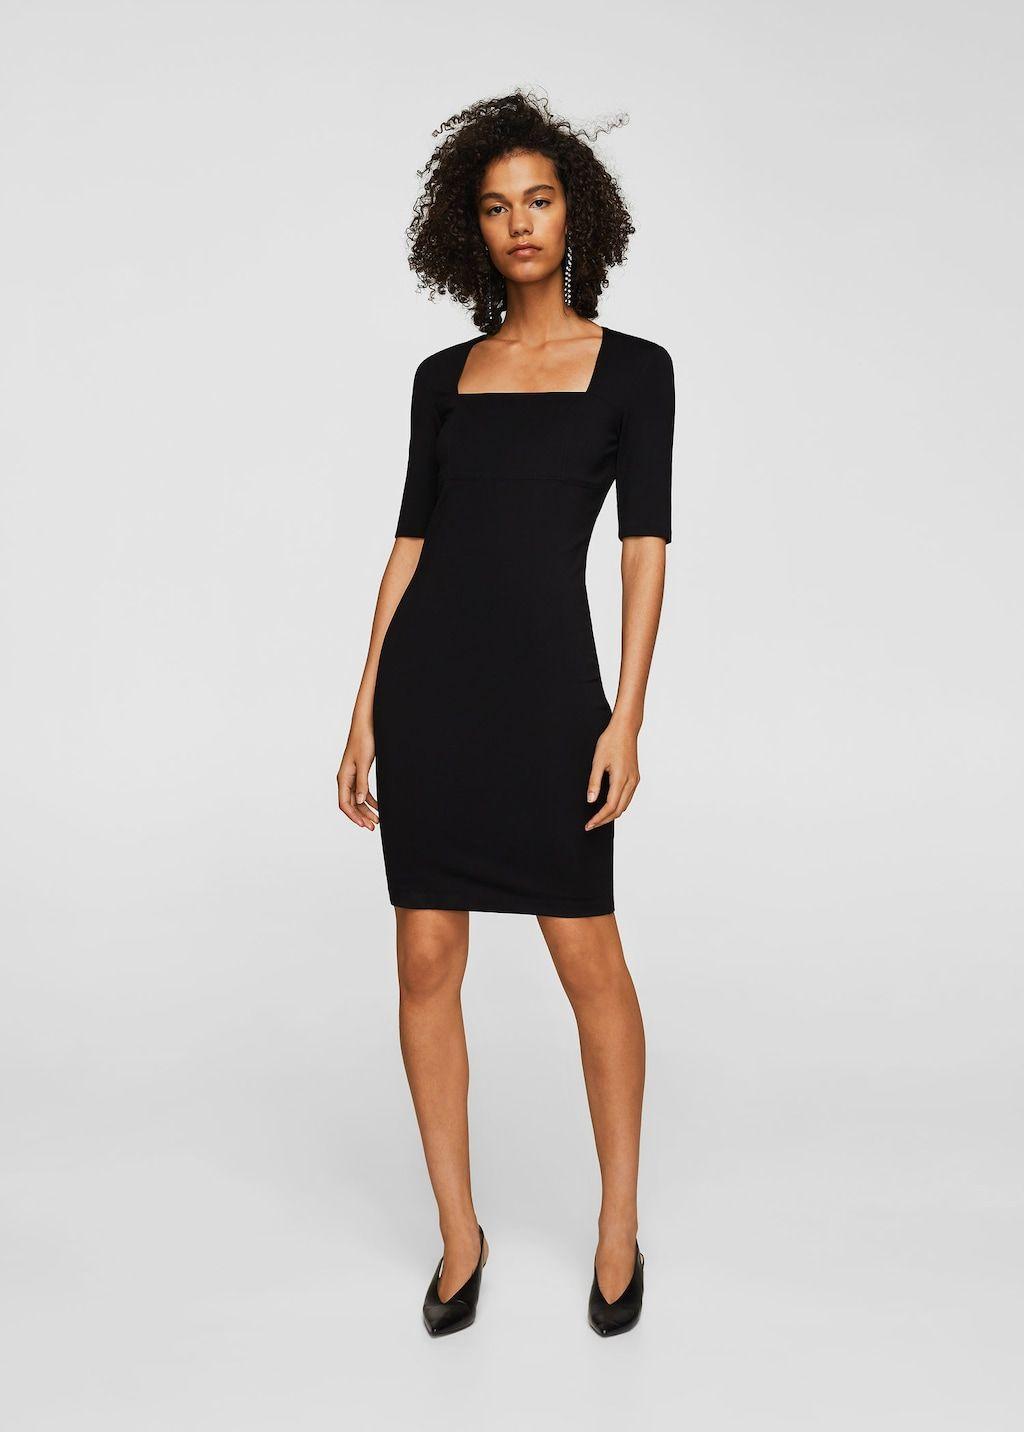 Squared Neckline Dress Women Mango Usa Square Neckline Dress Short Dresses Fashion [ 1432 x 1024 Pixel ]